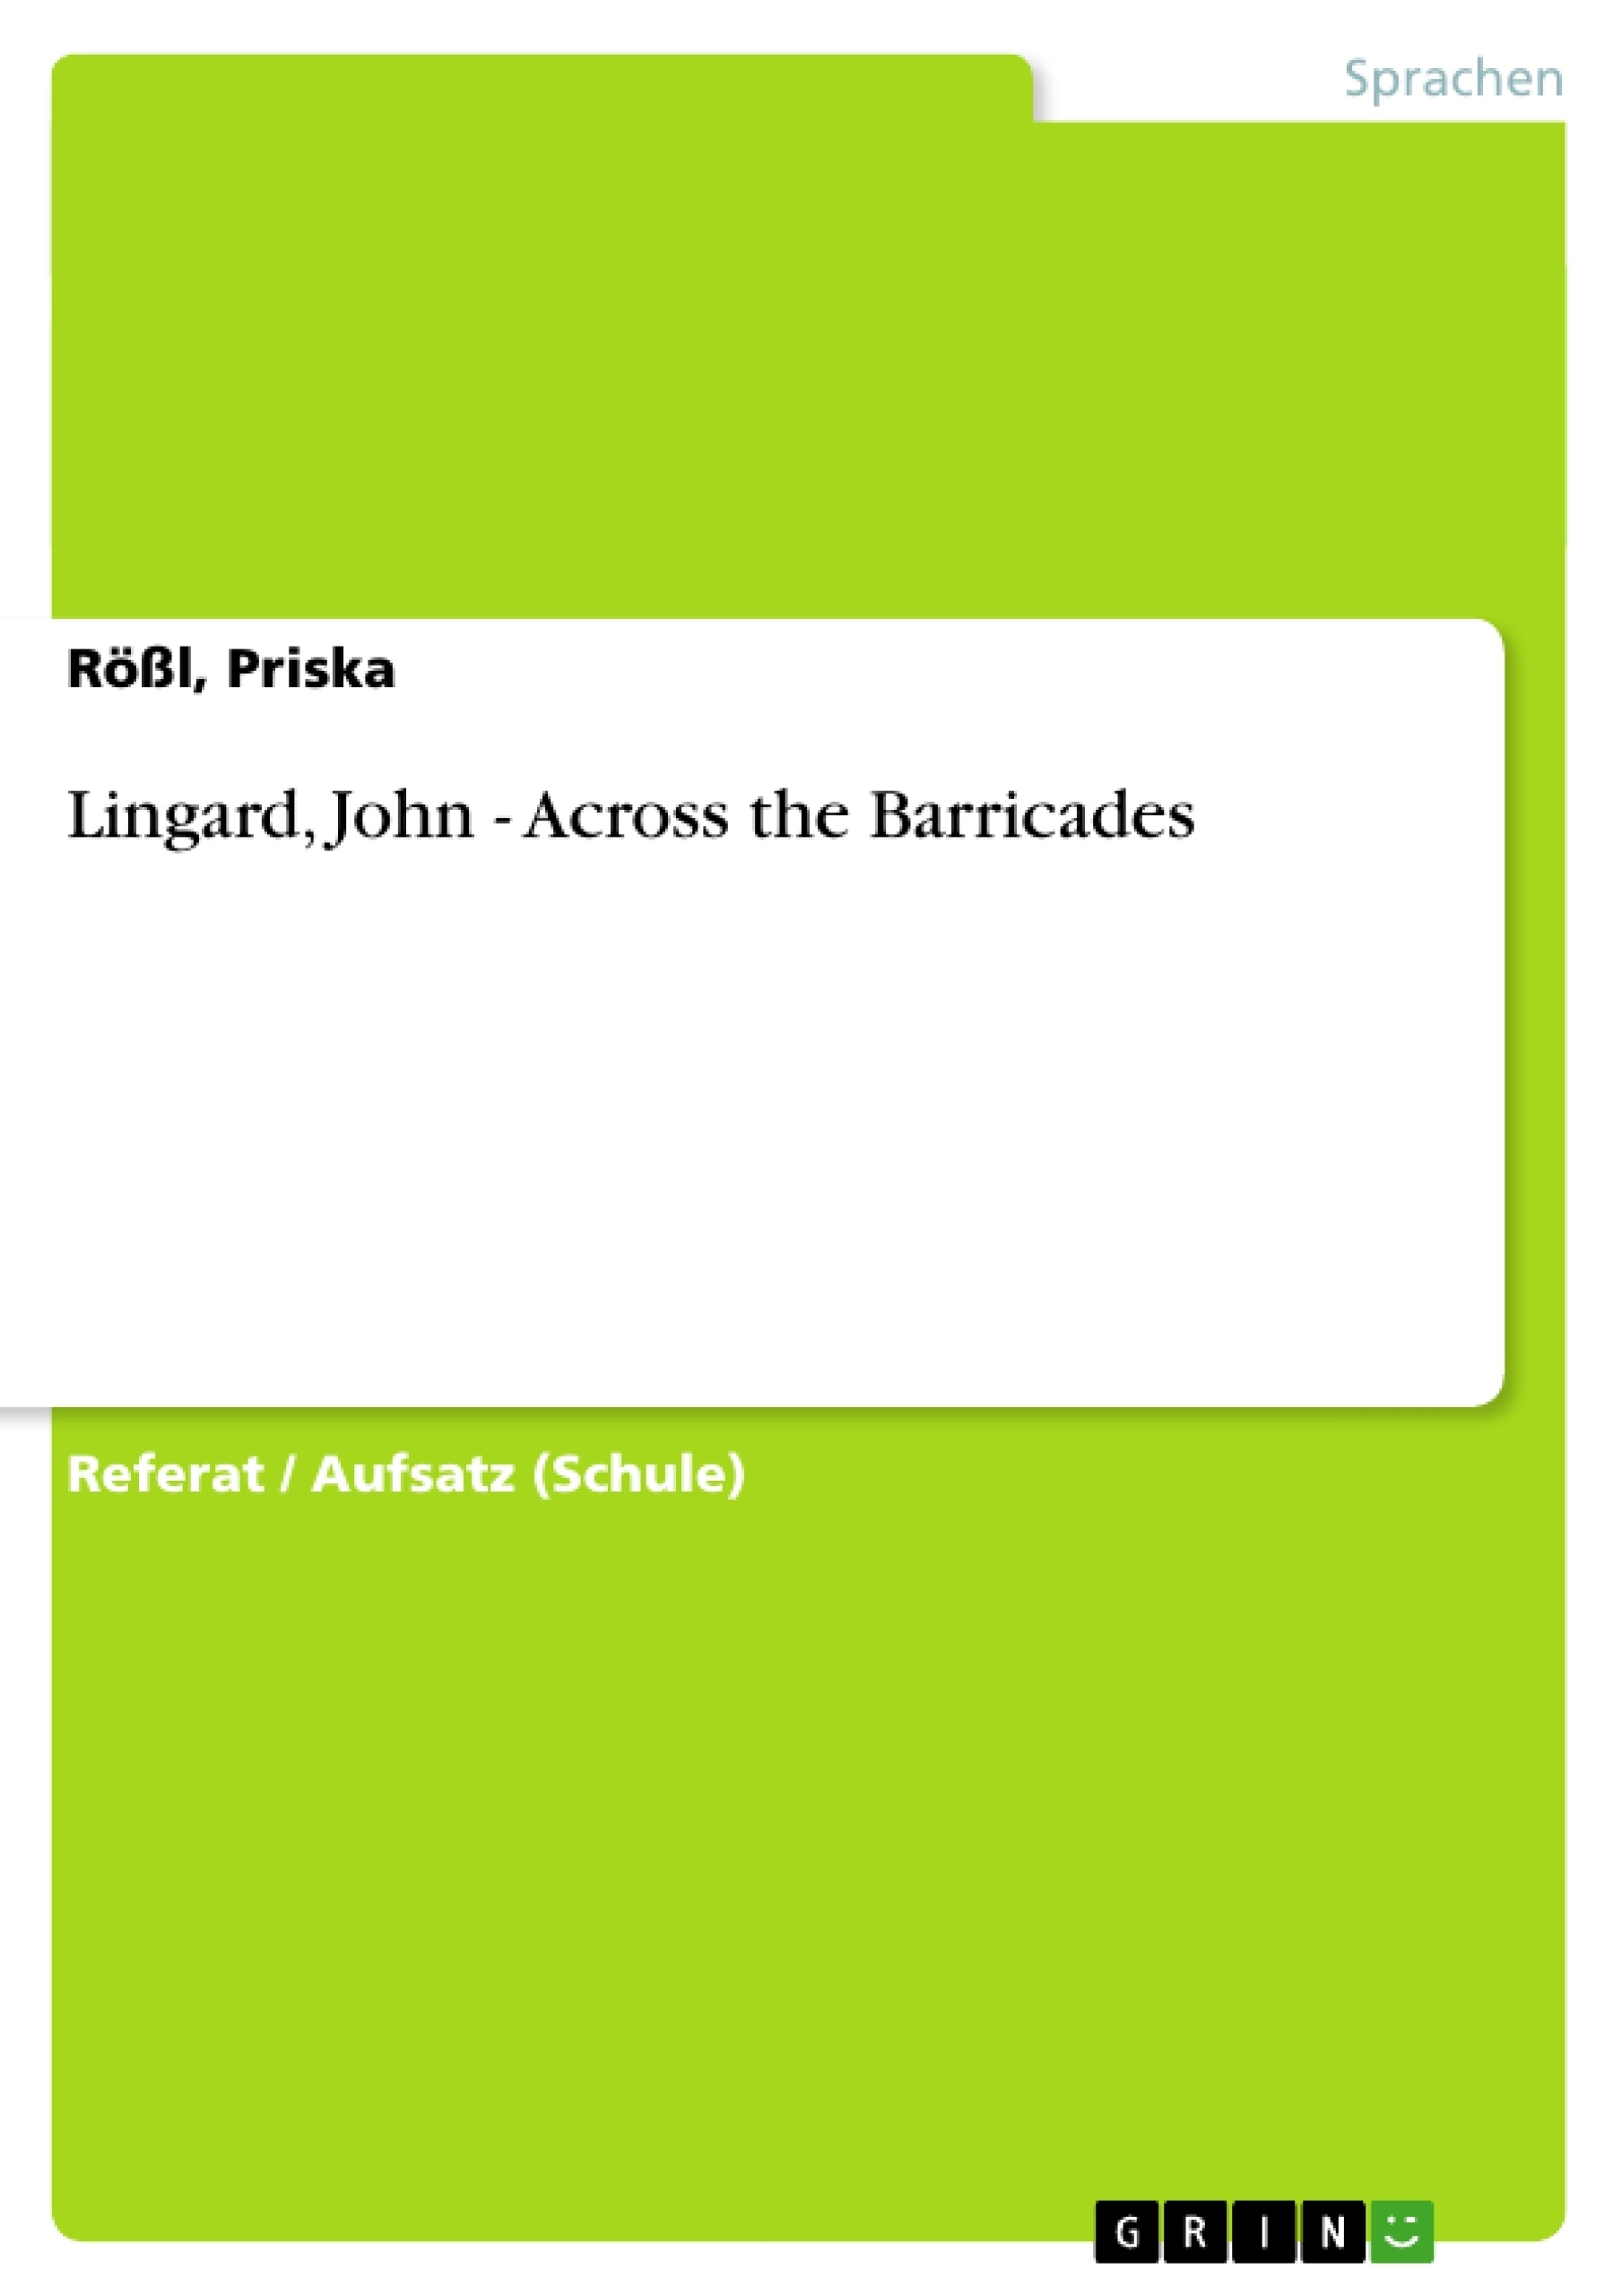 Titel: Lingard, John - Across the Barricades